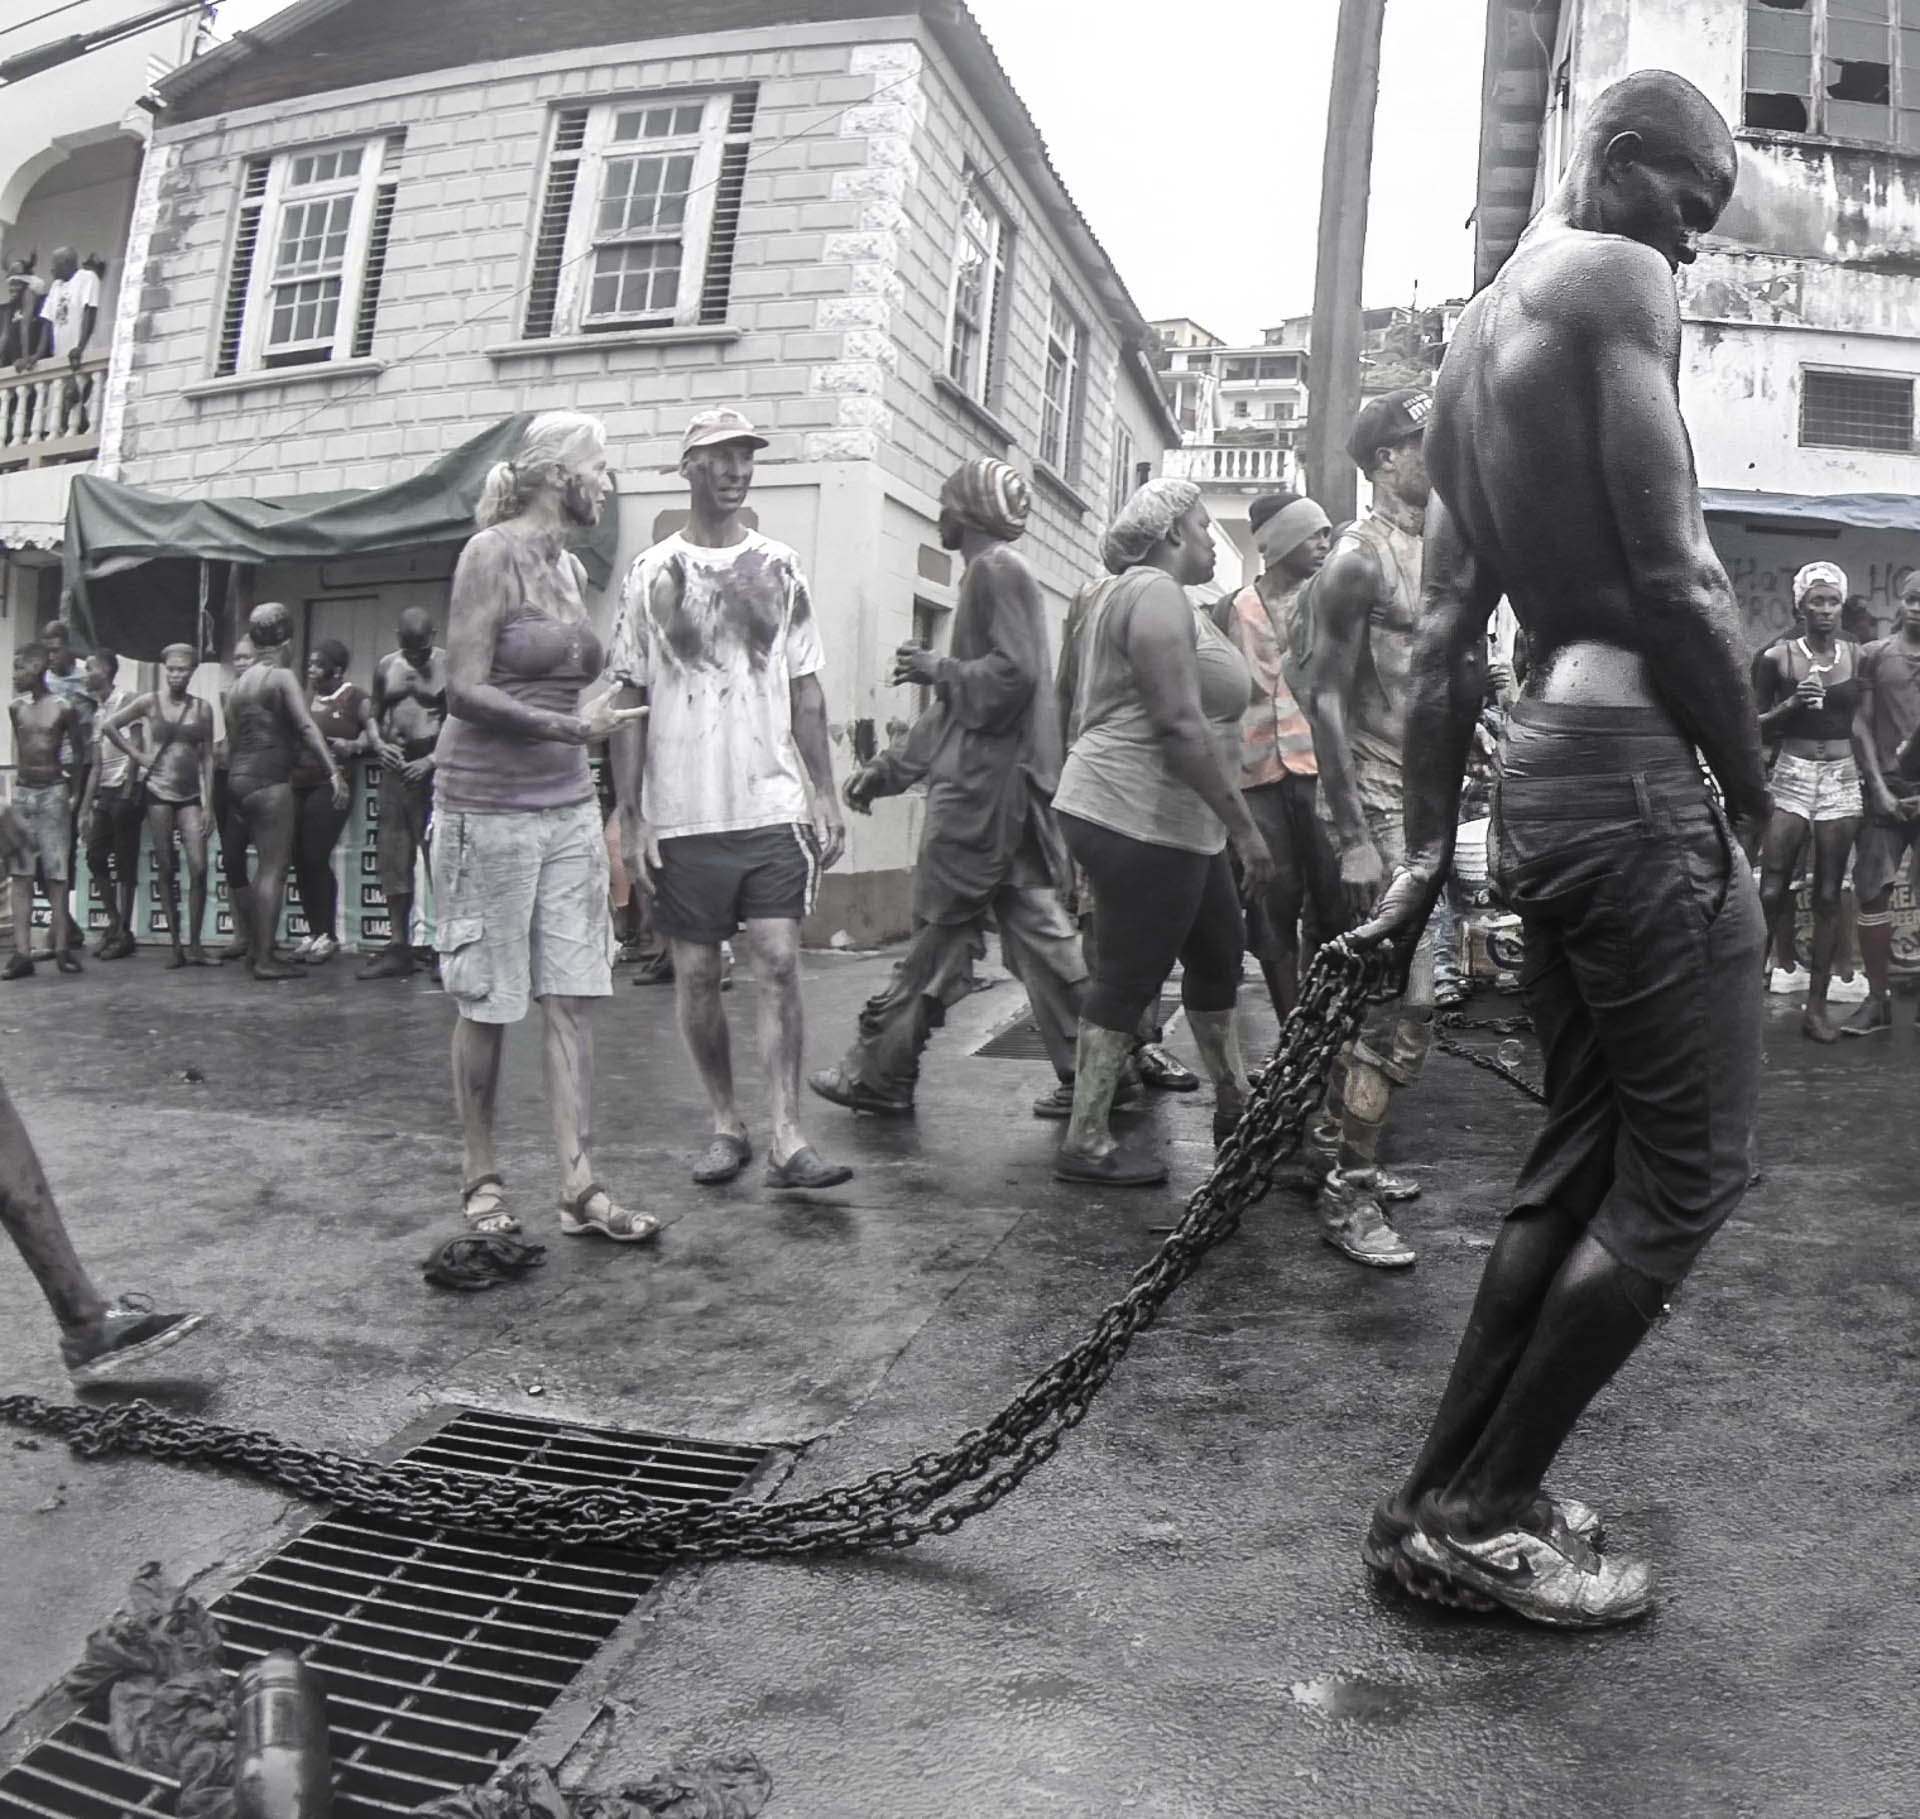 Many player held chains, representing enslavement- Video Still, Tom Miller